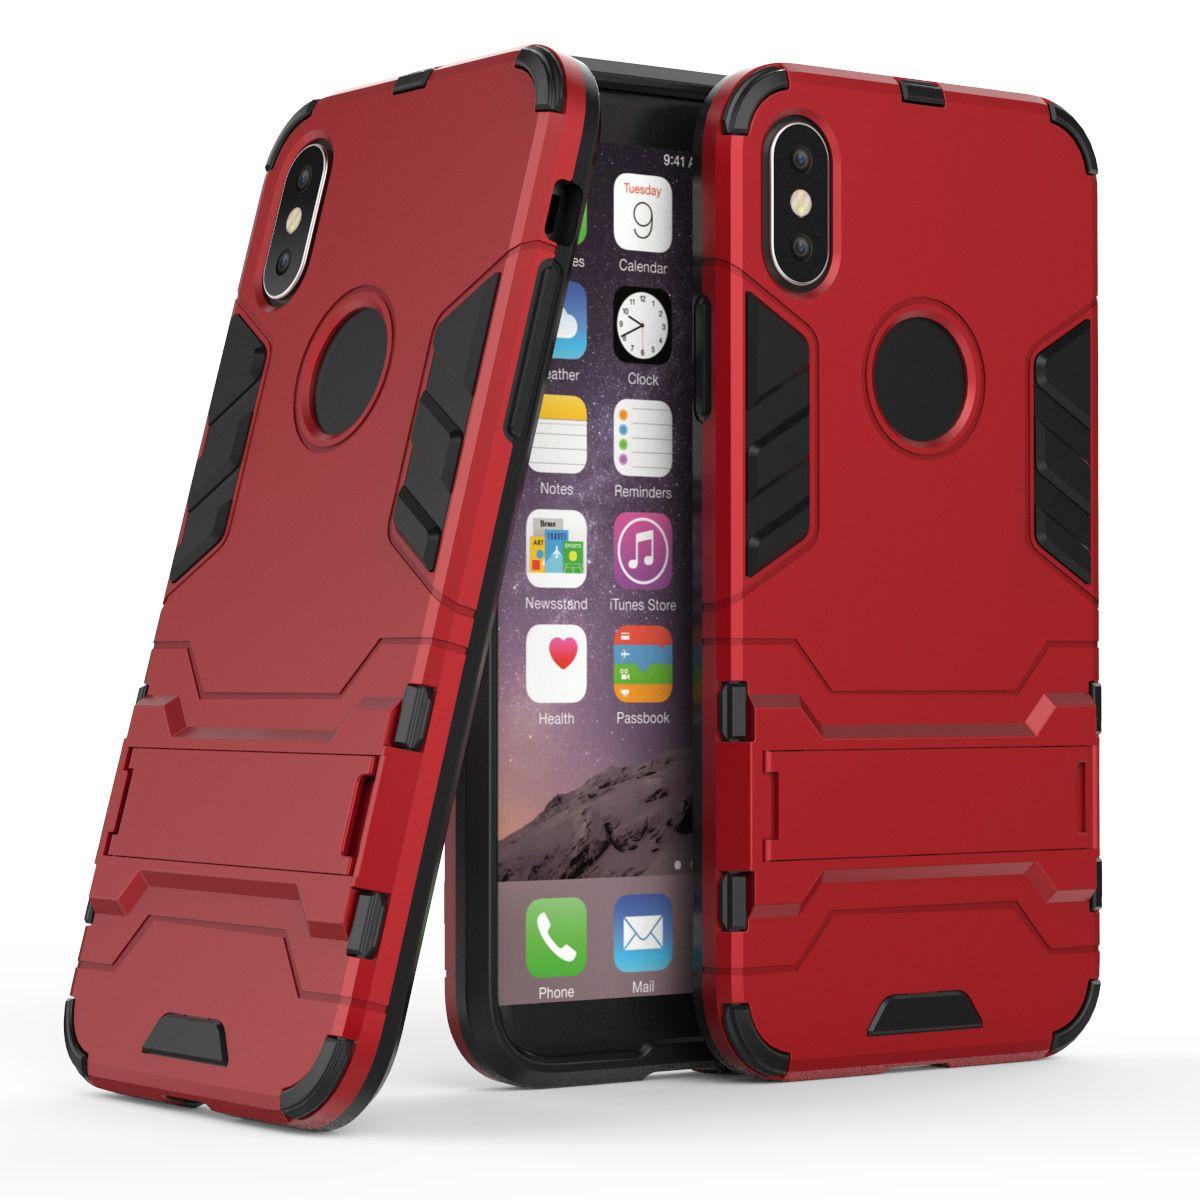 Iron Man Armor Case TPU PC With Kickstand Feature Back Case For LG LV3 LV1  LV5 K20 Plus Harmony K20 V Grace M250 K7 K8 Tribute 5 Escape 3